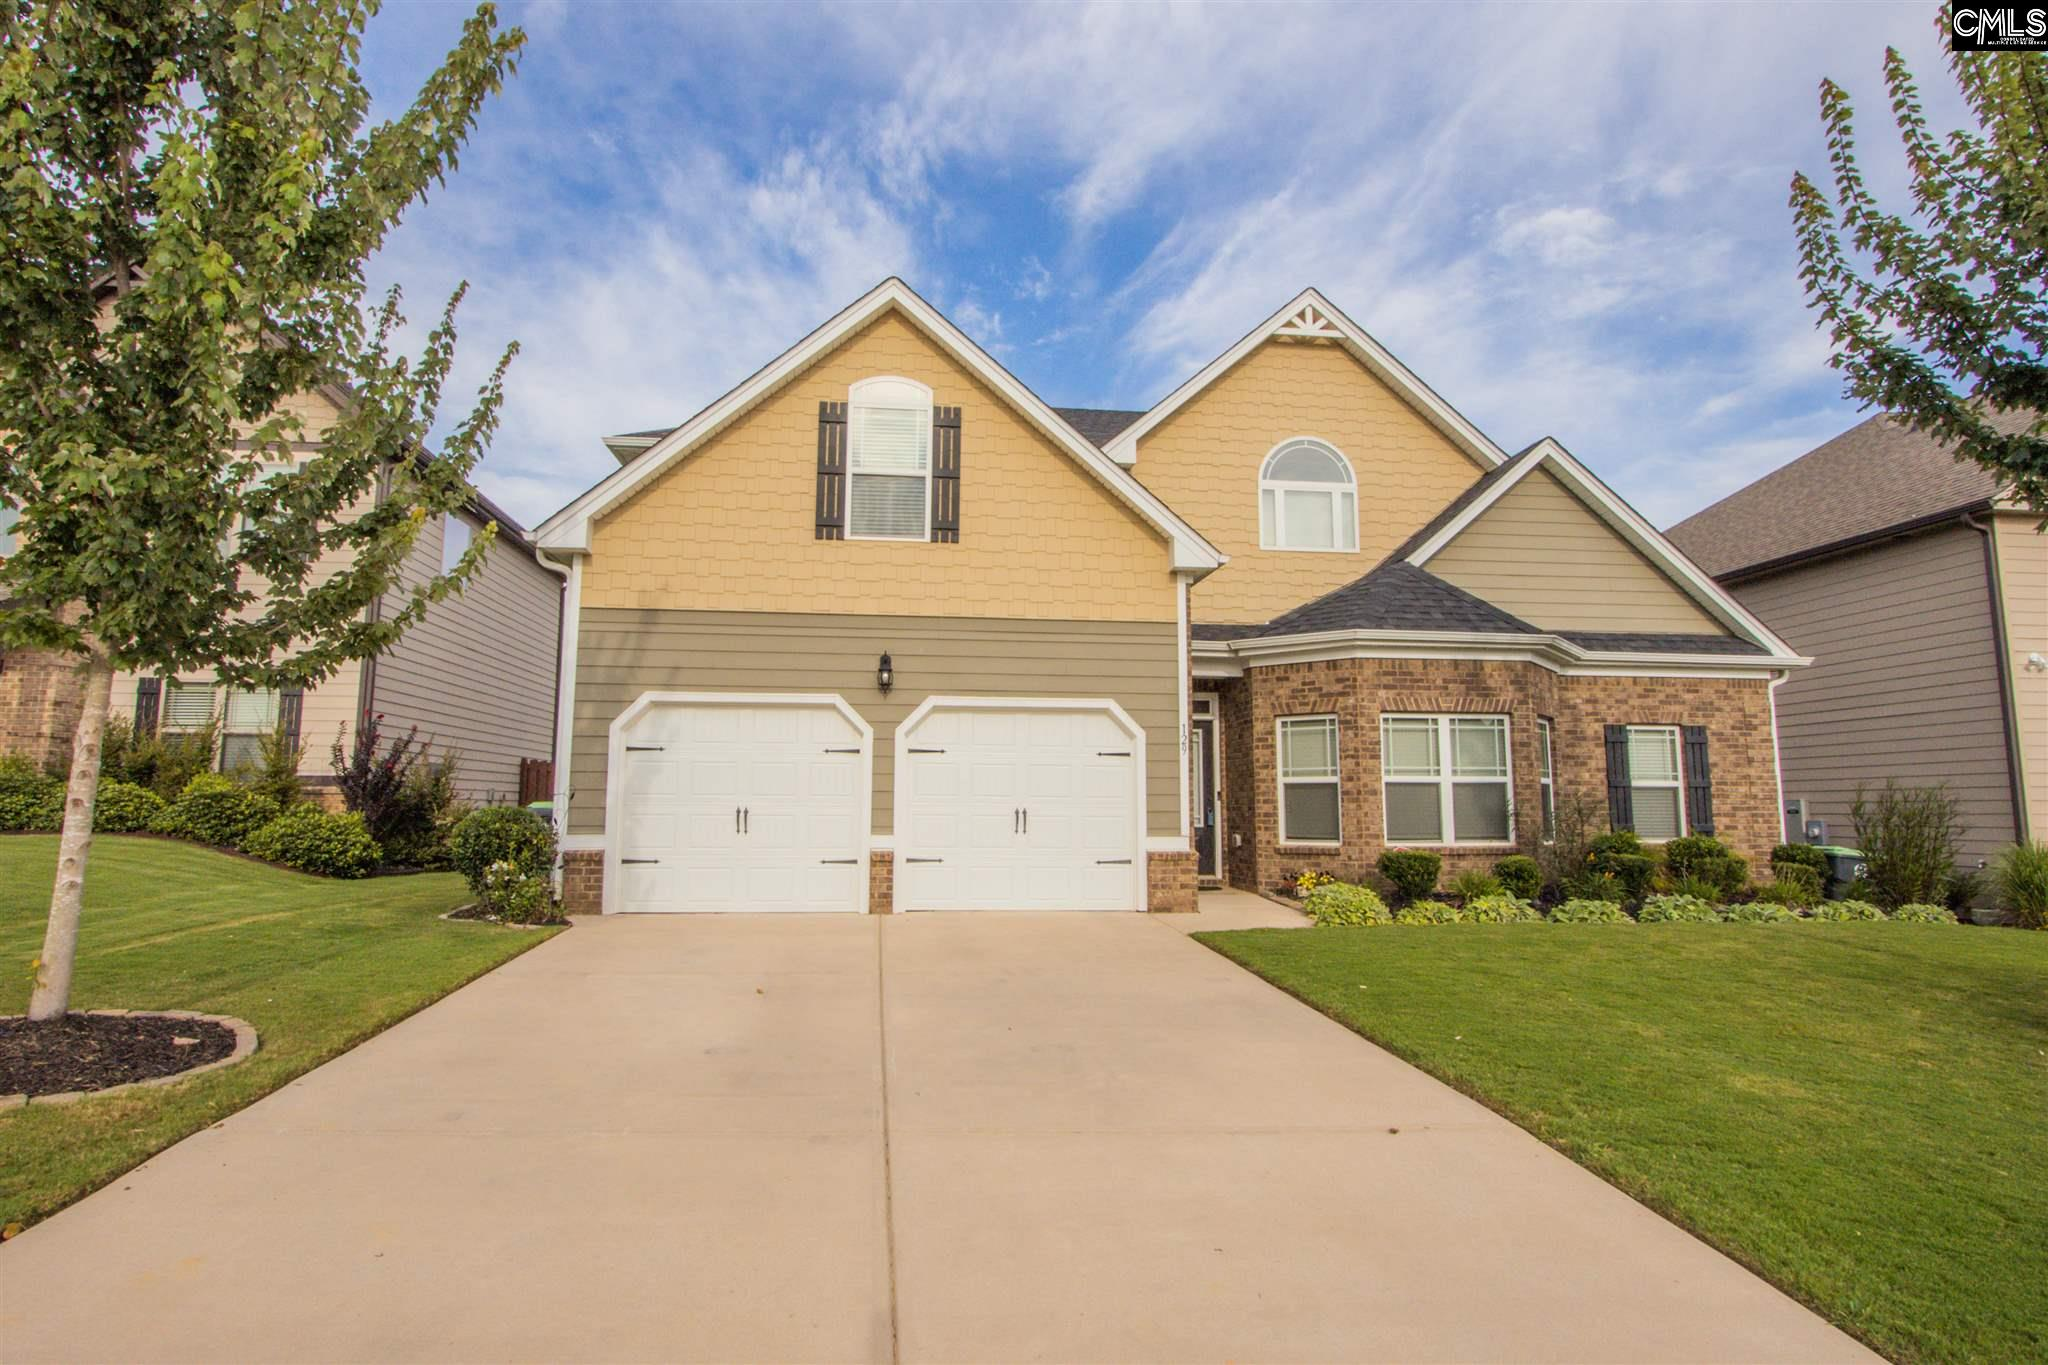 129 Village Green Lexington, SC 29072-8005